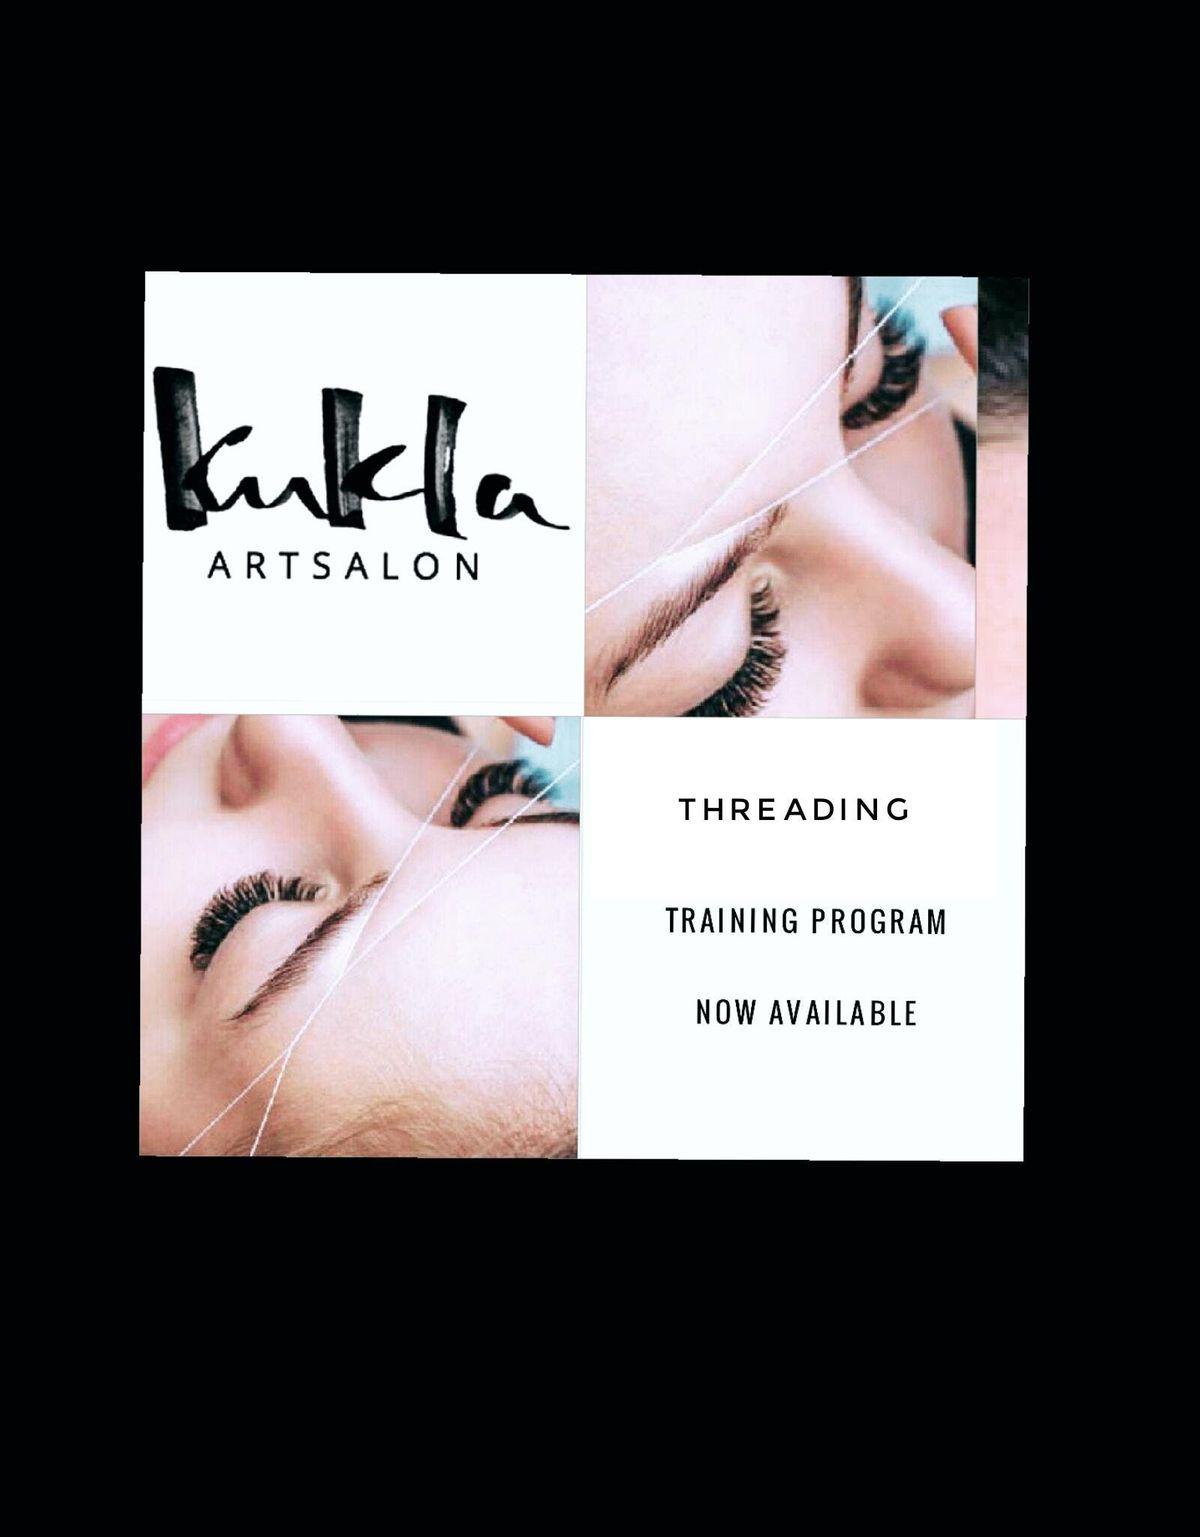 Eyebrows Threading And Full Face Training At Kukla Artsalon Miami Beach